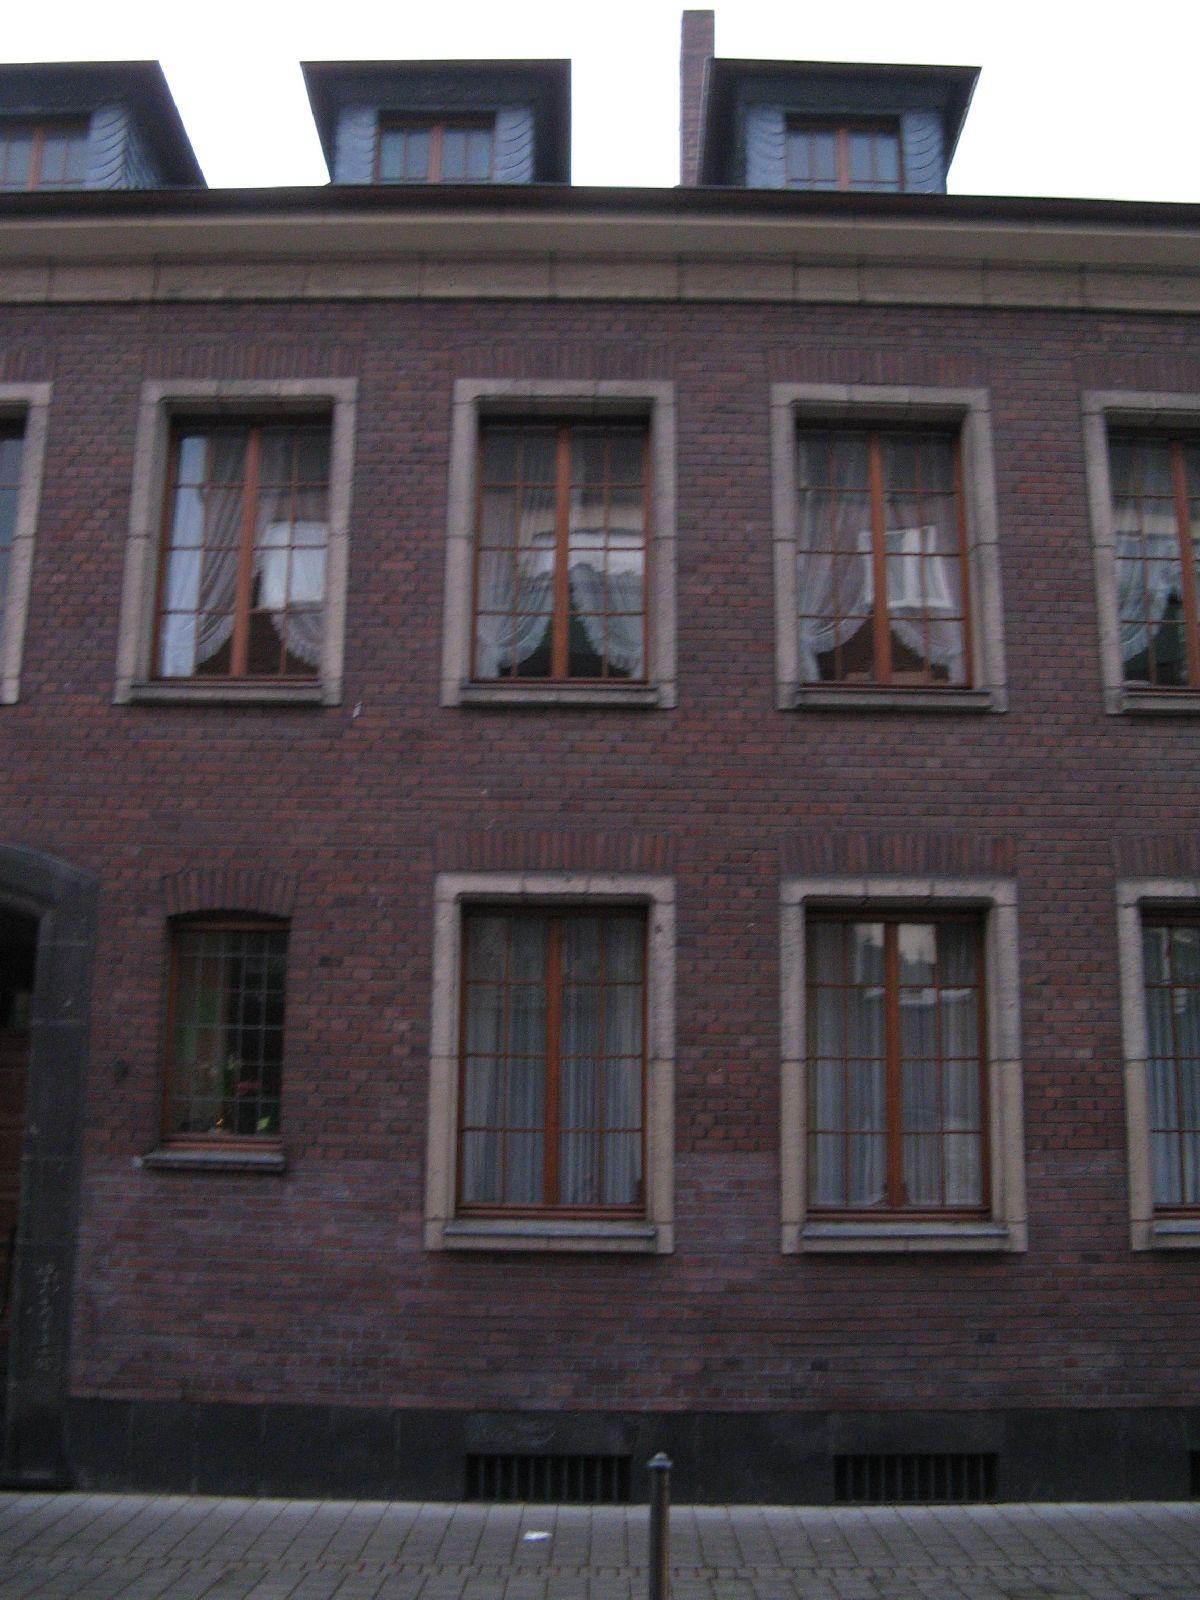 Gebaeude-Architektur_Textur_B_1256